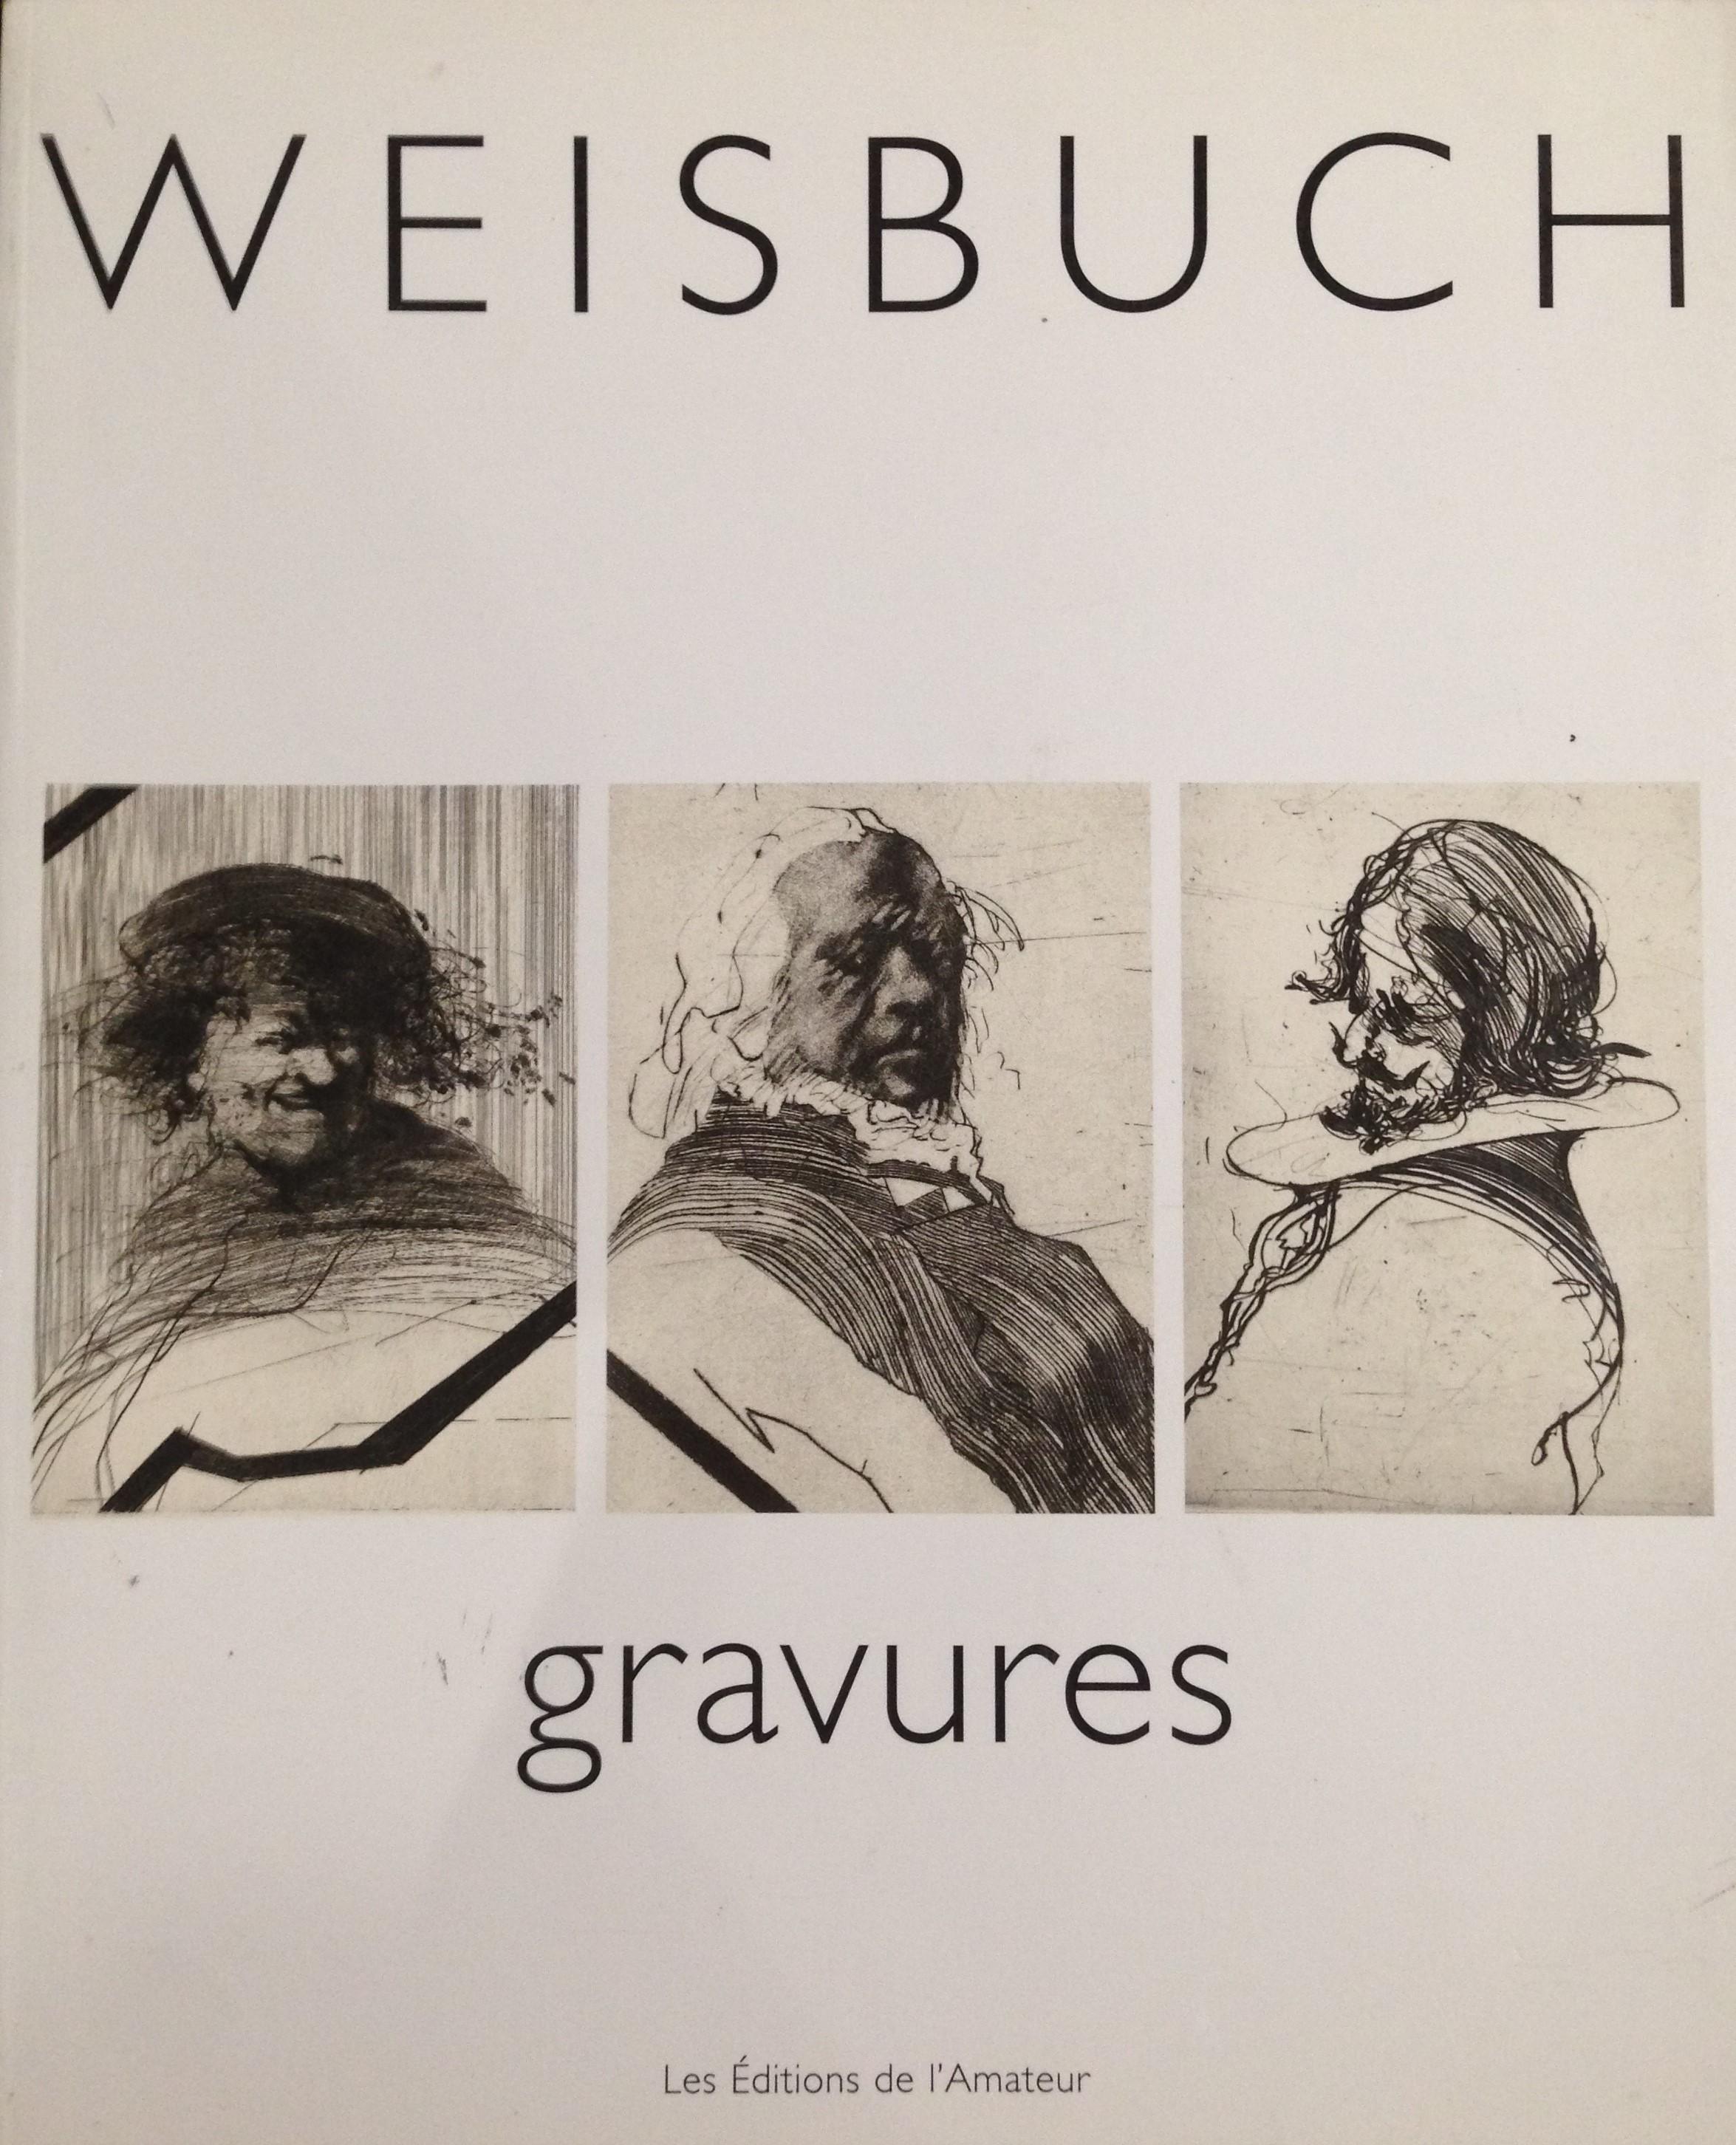 Weisbuch - Gravures